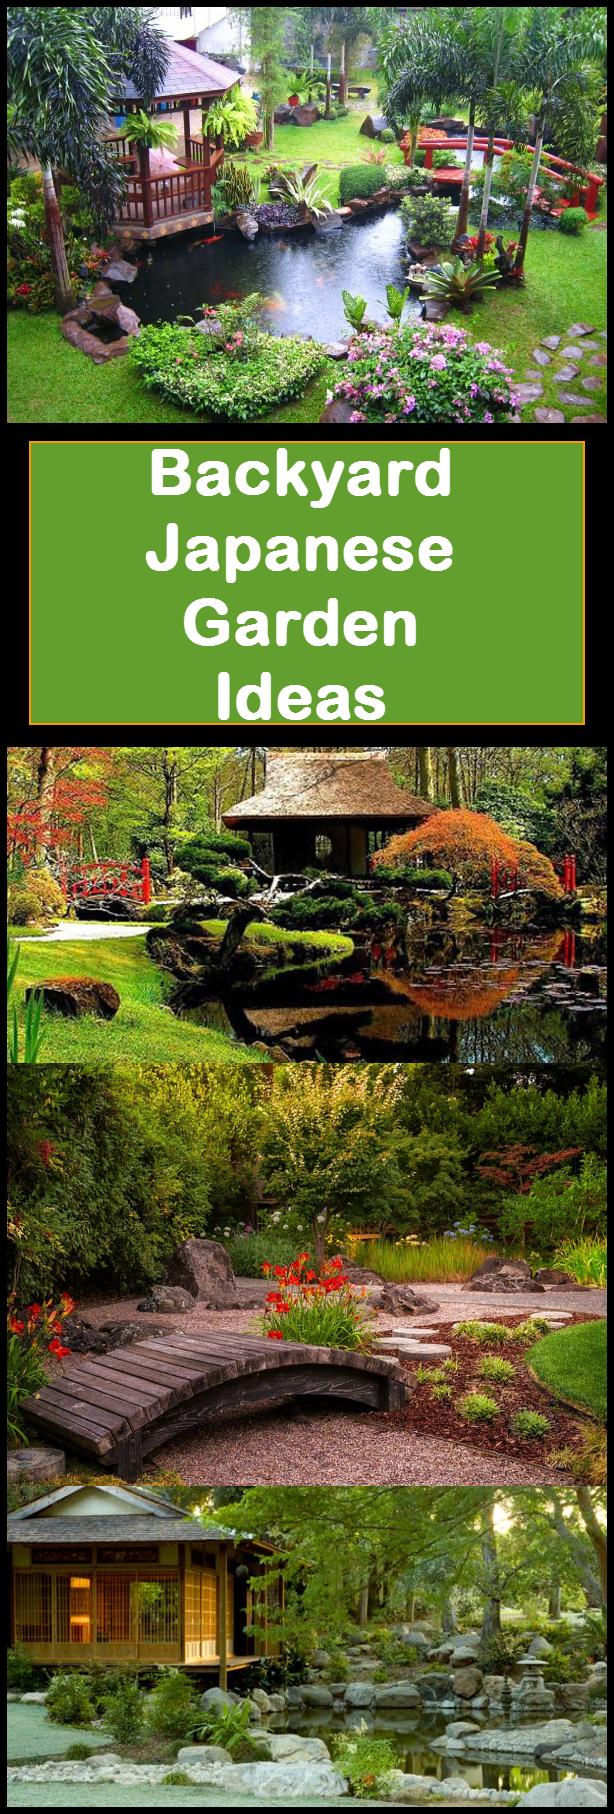 Backyard japanese garden tips and ideas backyard for Make your own japanese garden